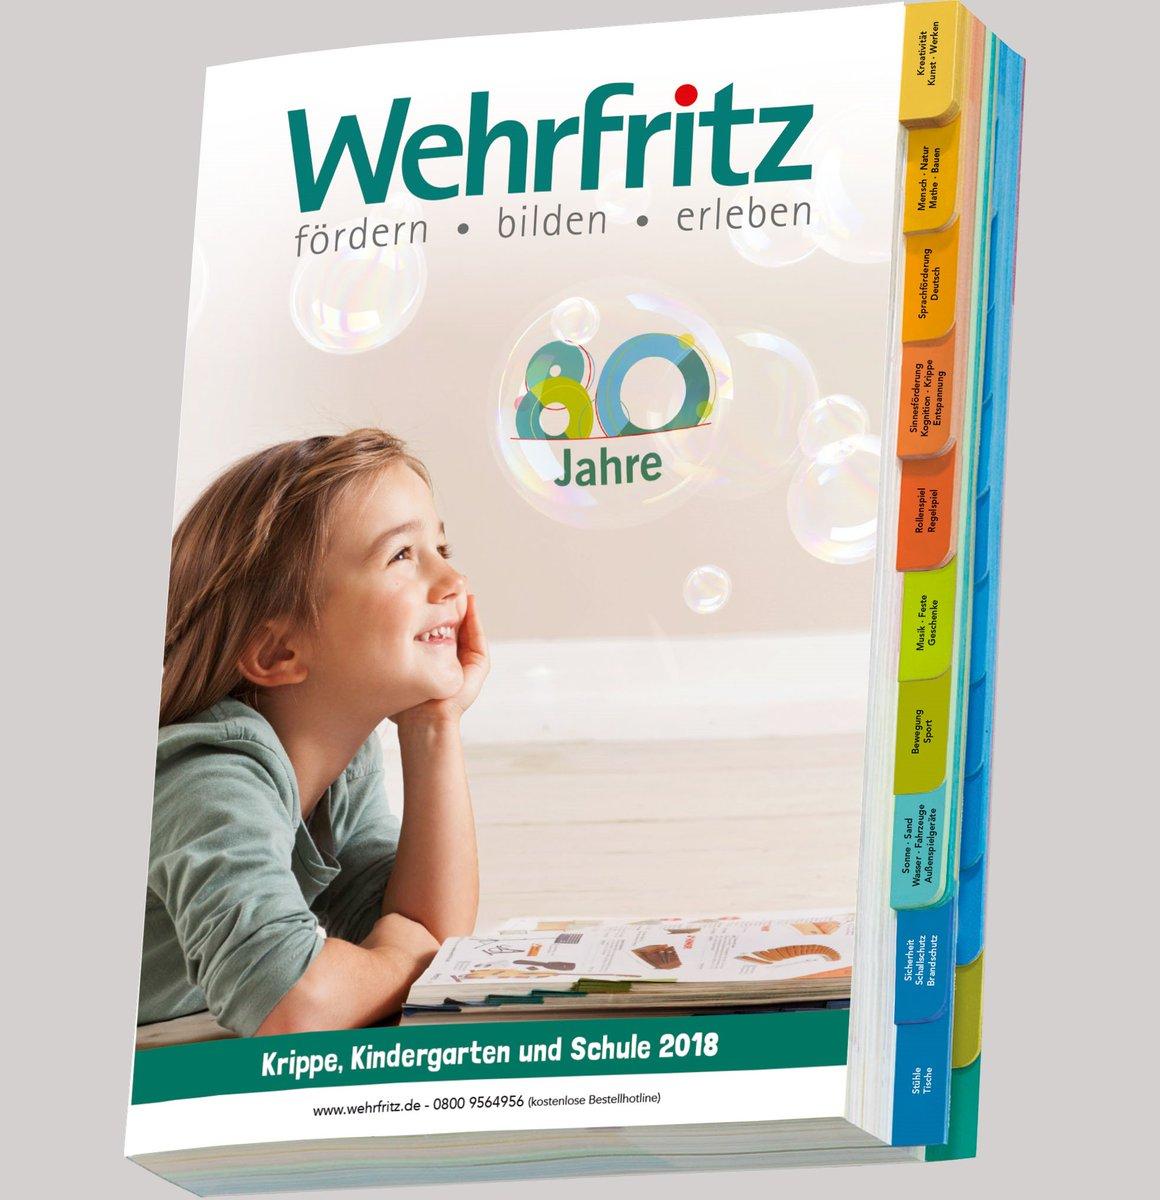 wehrfritz gmbh wehrfritz com twitter. Black Bedroom Furniture Sets. Home Design Ideas